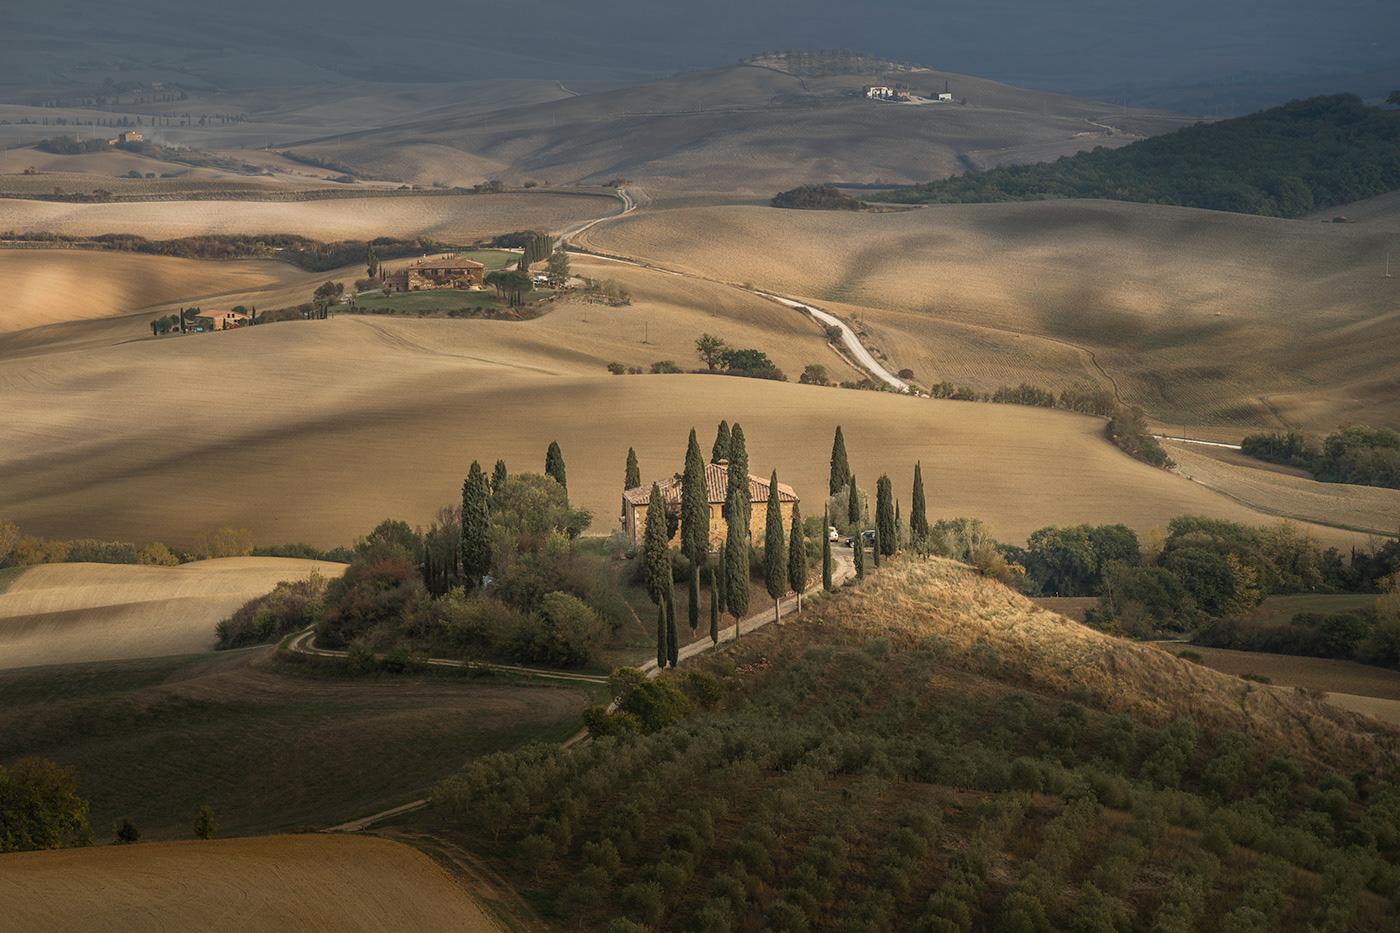 Landscape Tuscany Italy Photography  Travel Nature landscape photography sunset hills Val dOrcia